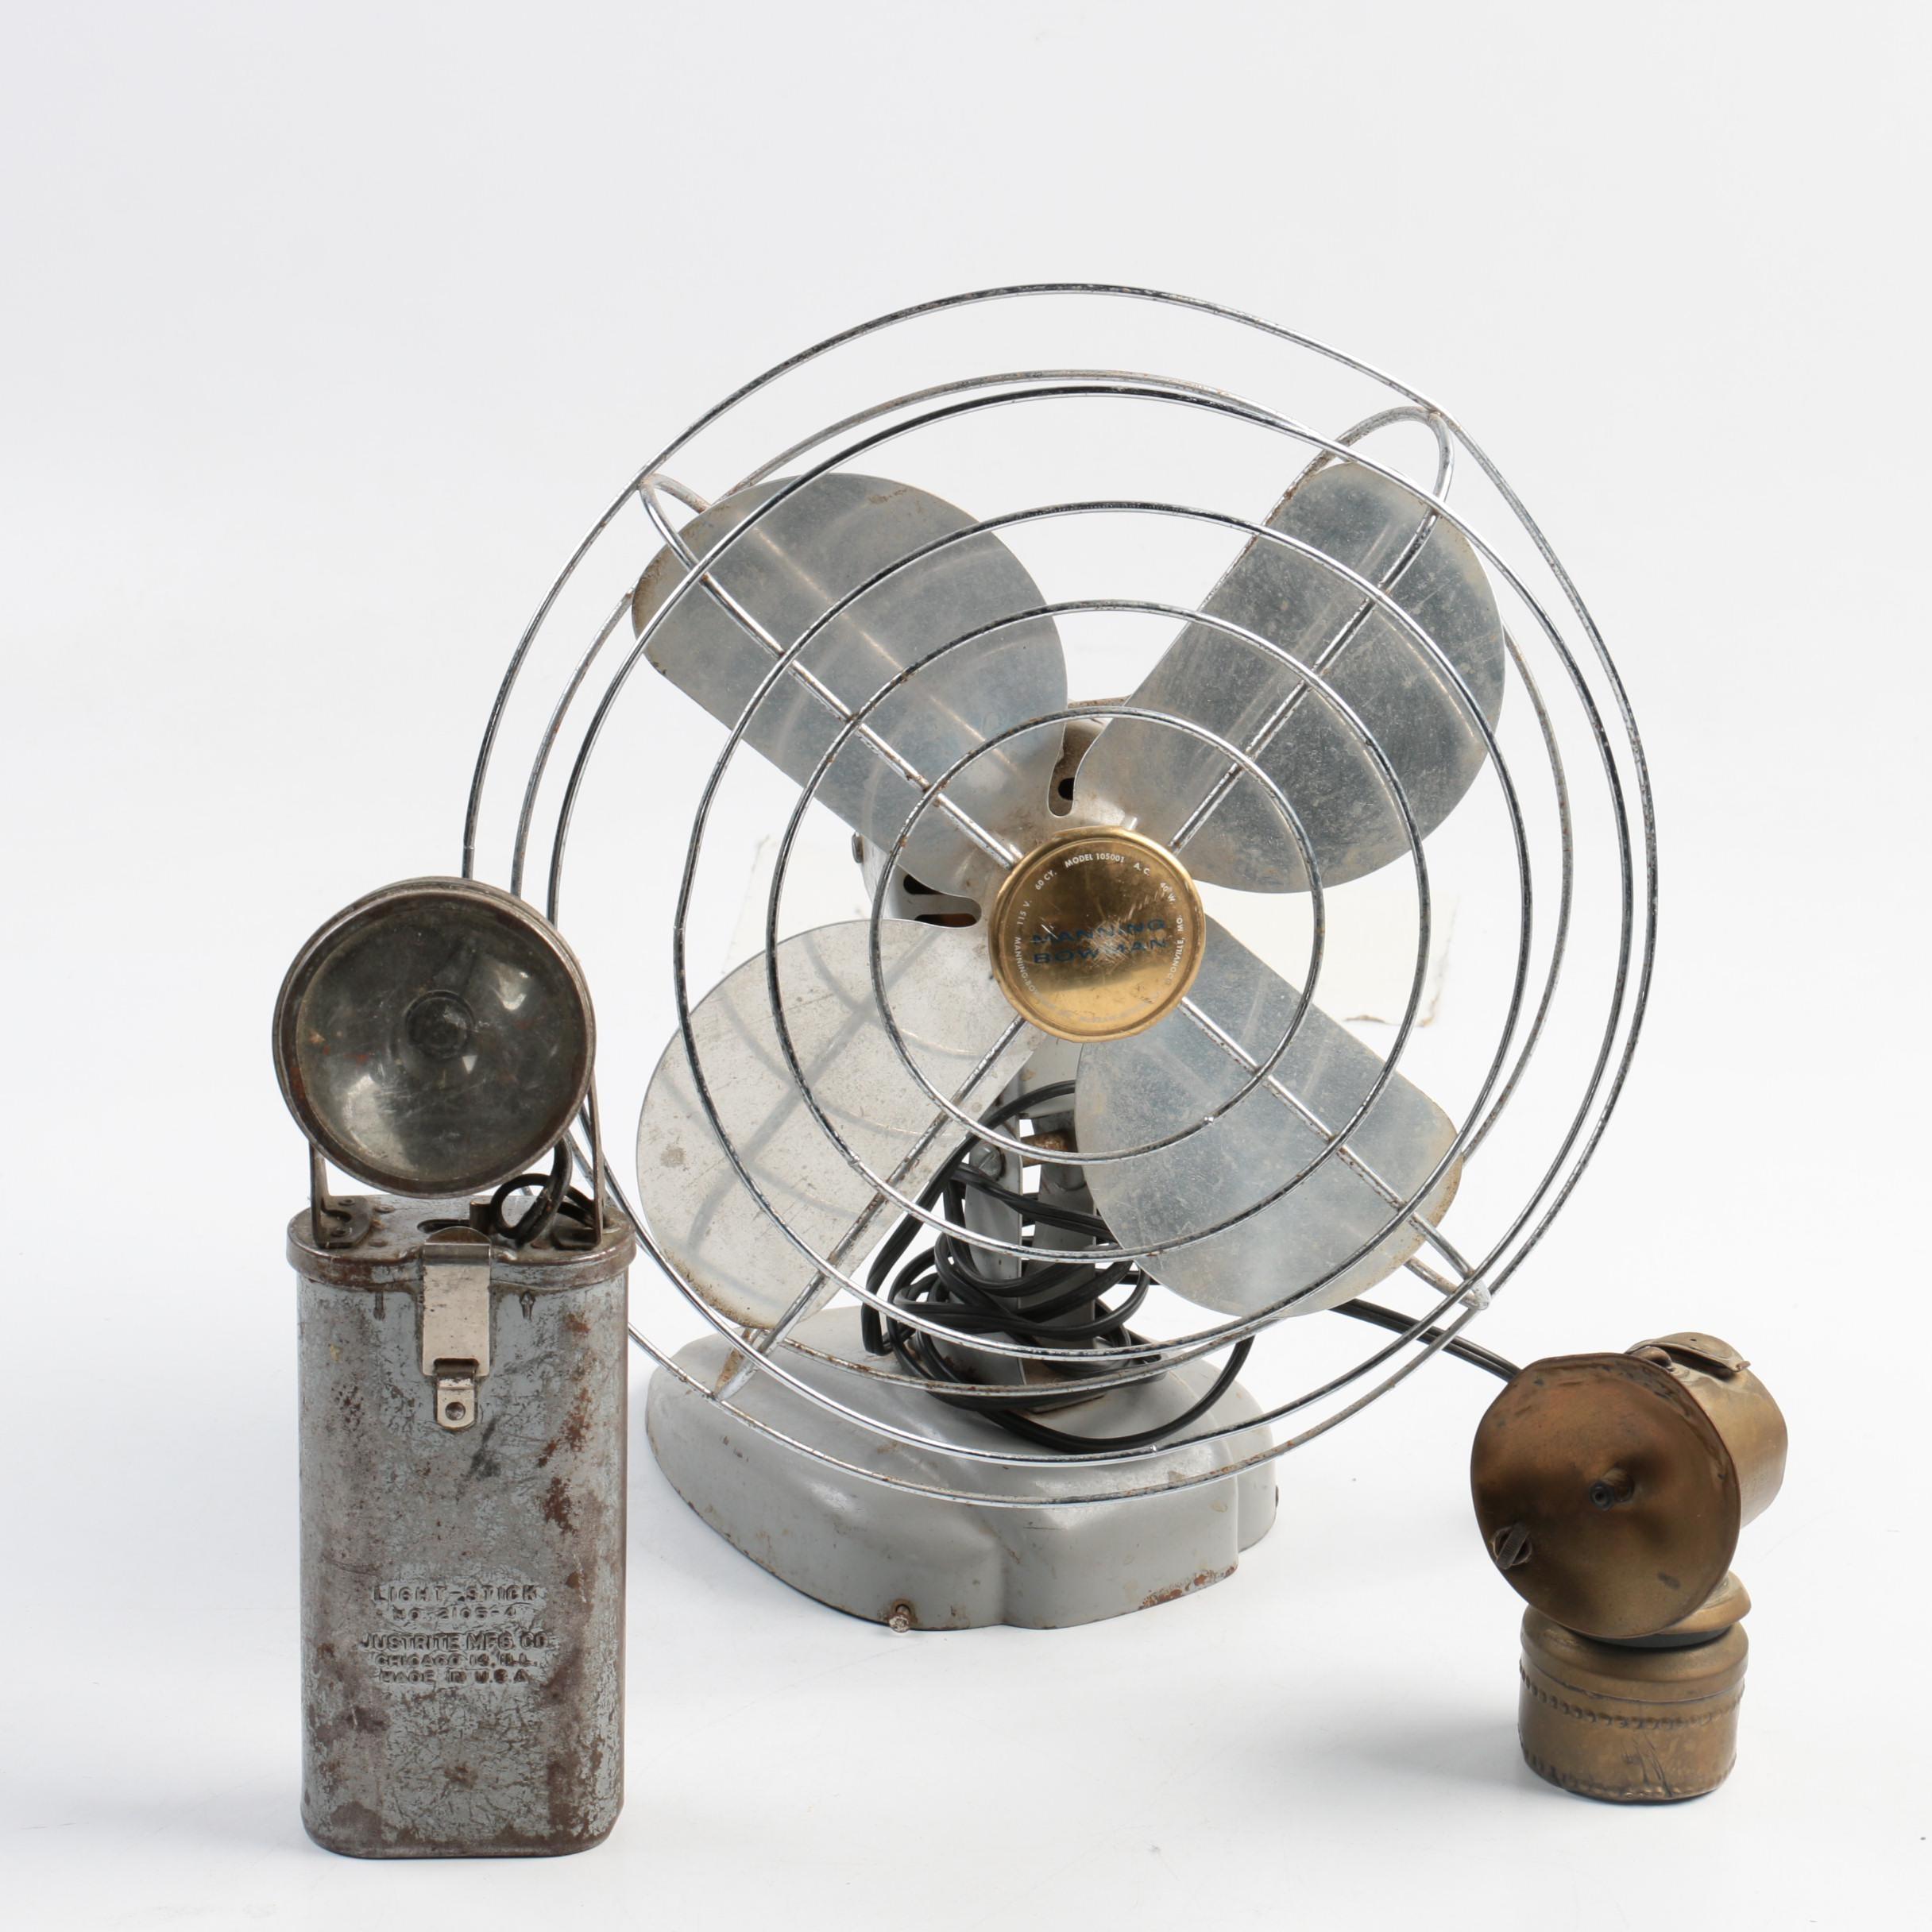 Antique Justrite Mining Lamp, Vintage Light-Stick, and Manning Bowman Desk Fan